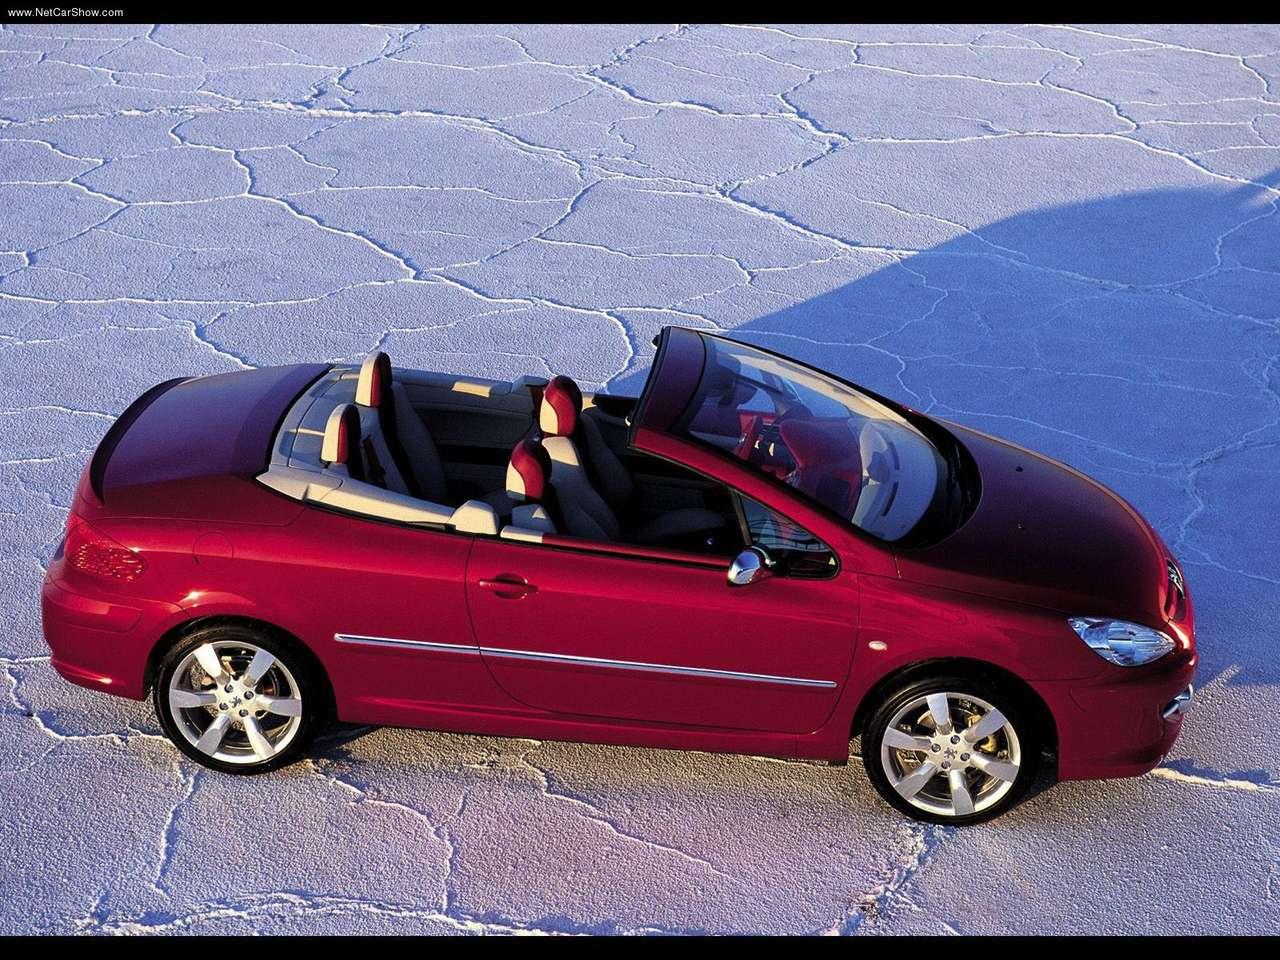 http://1.bp.blogspot.com/-CulOHs83Kiw/TXs8tlb592I/AAAAAAAANQA/8v-ifk8-9yc/s1600/Peugeot-307CC_Concept_2002_1280x960_wallpaper_04.jpg